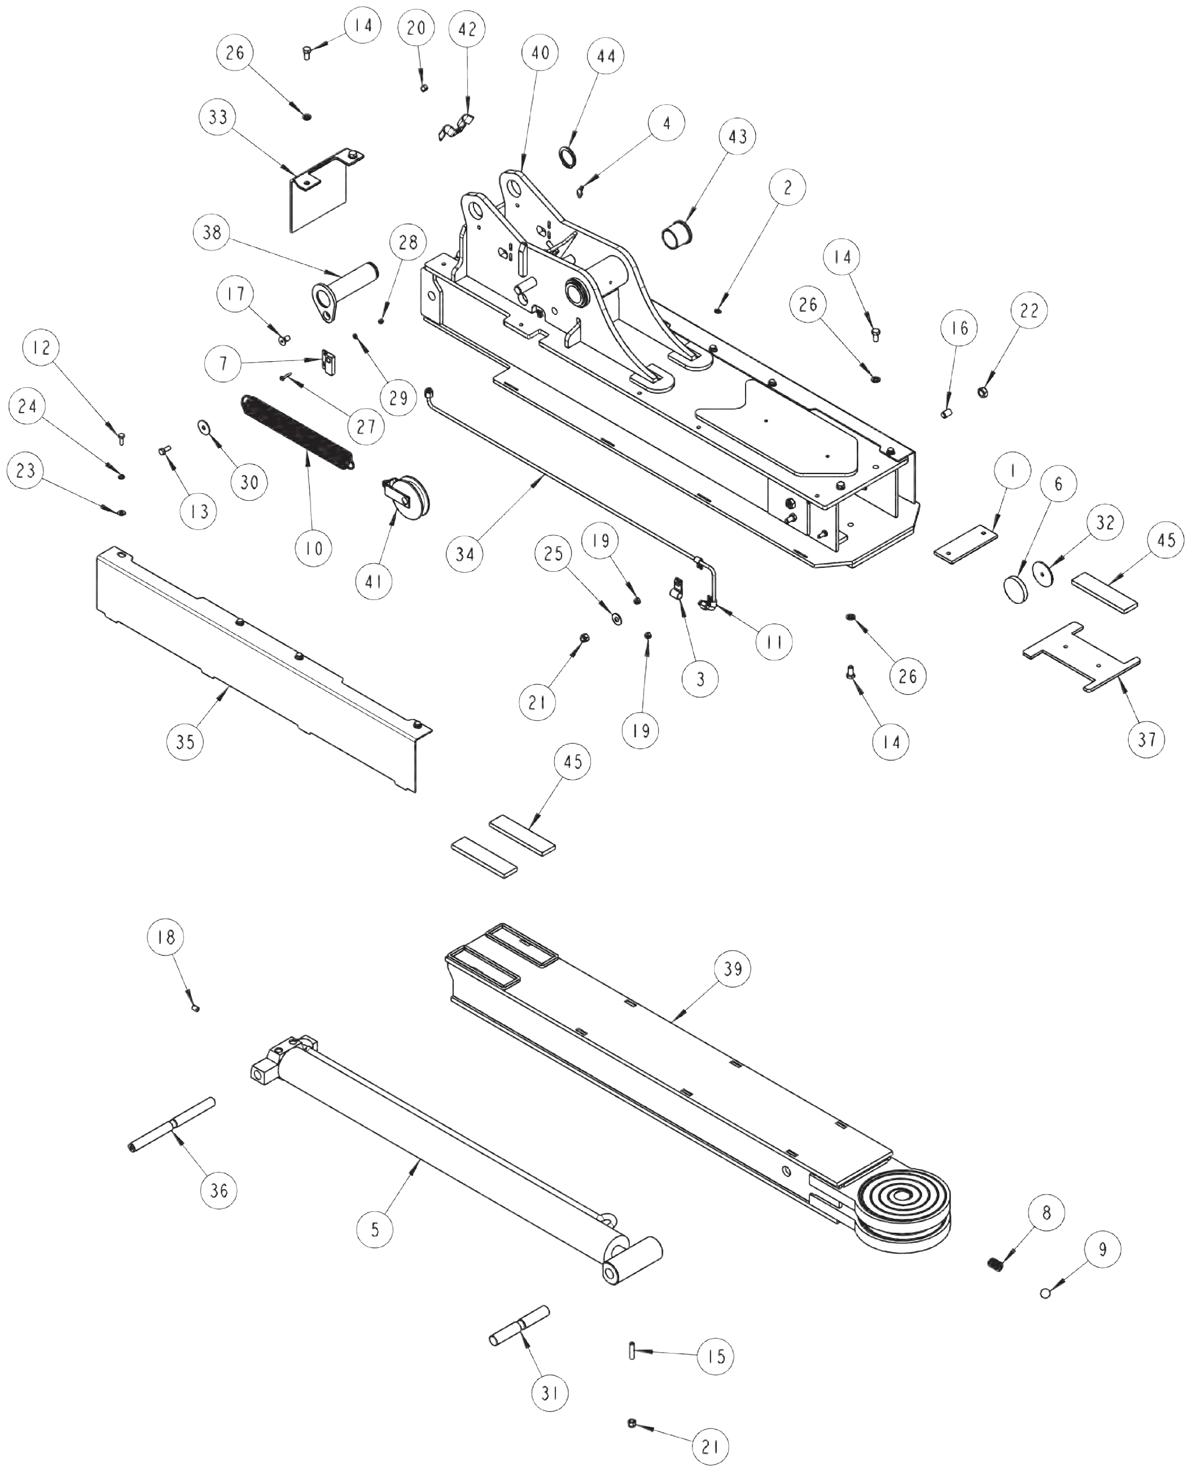 alfa romeo 156 jtd wiring diagram wiring library Alfa Romeo Spider Veloce gopro pole grip by smatree besides alfa romeo 156 jtd wiring diagram further